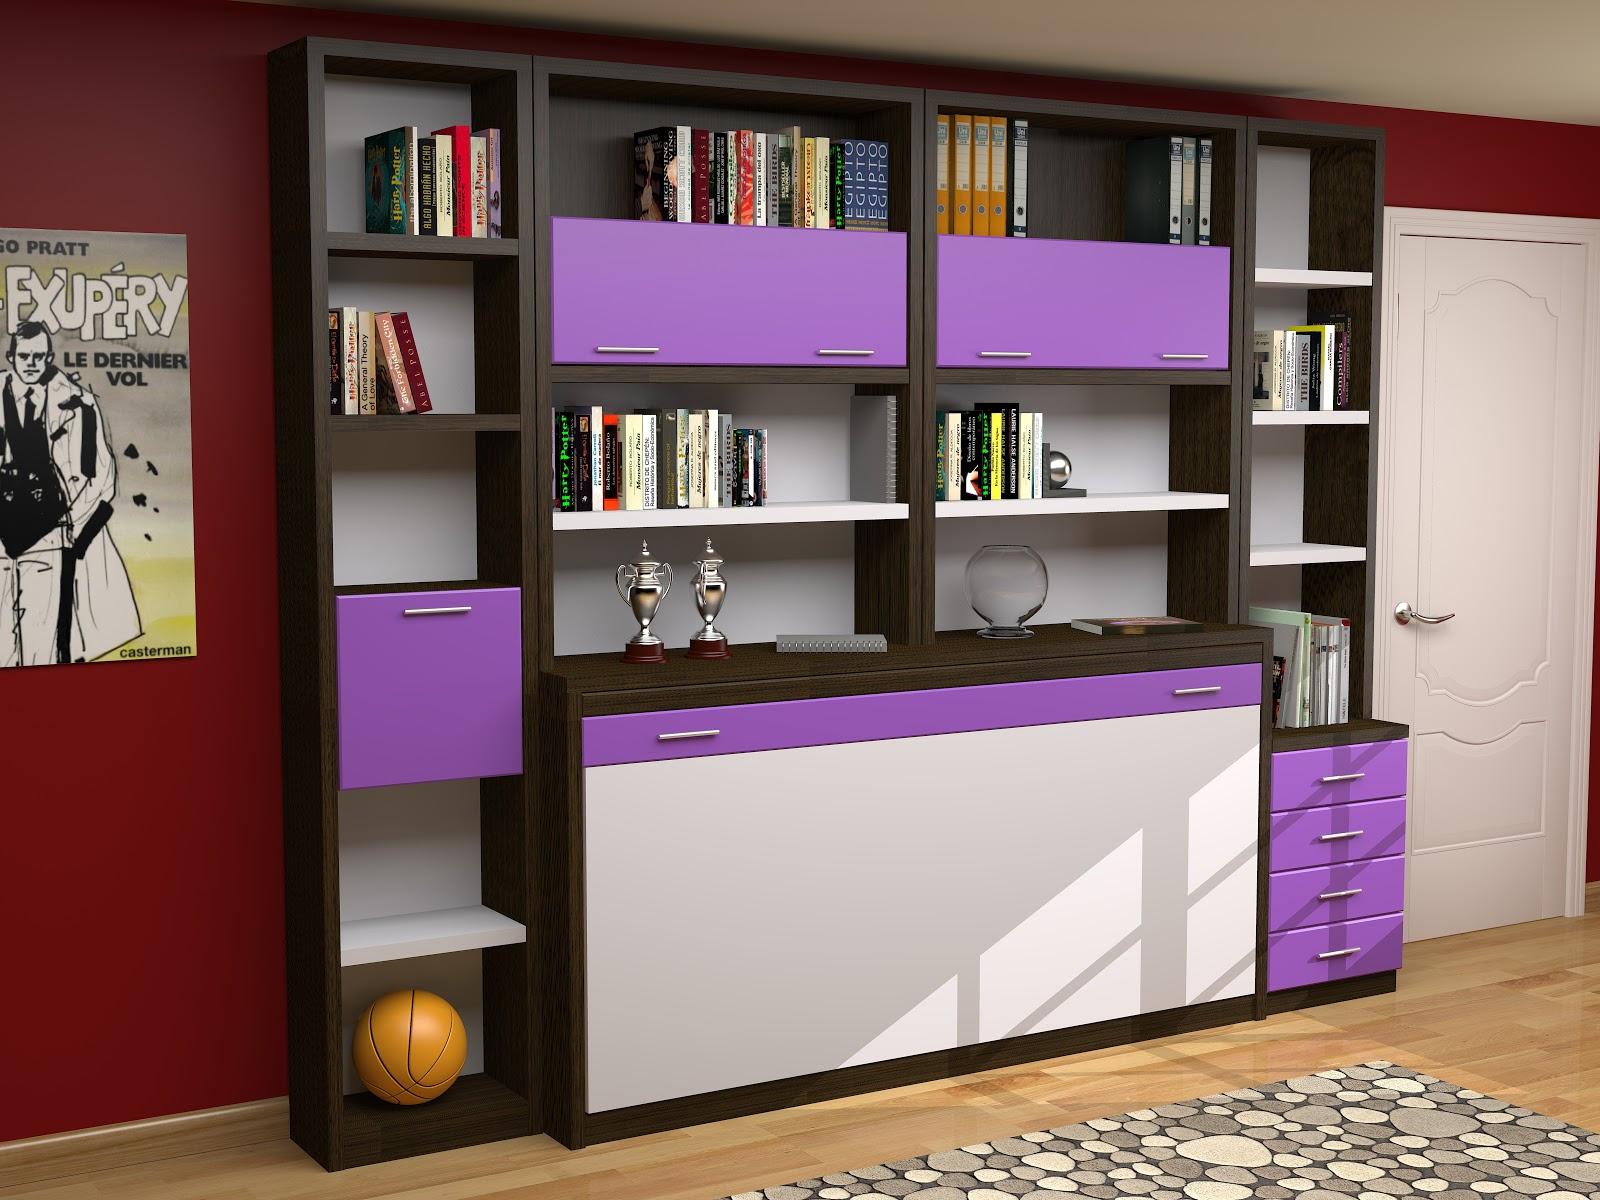 Camas abatibles en madrid camas abatibles toledo cama for Diseno de libreros para espacios pequenos